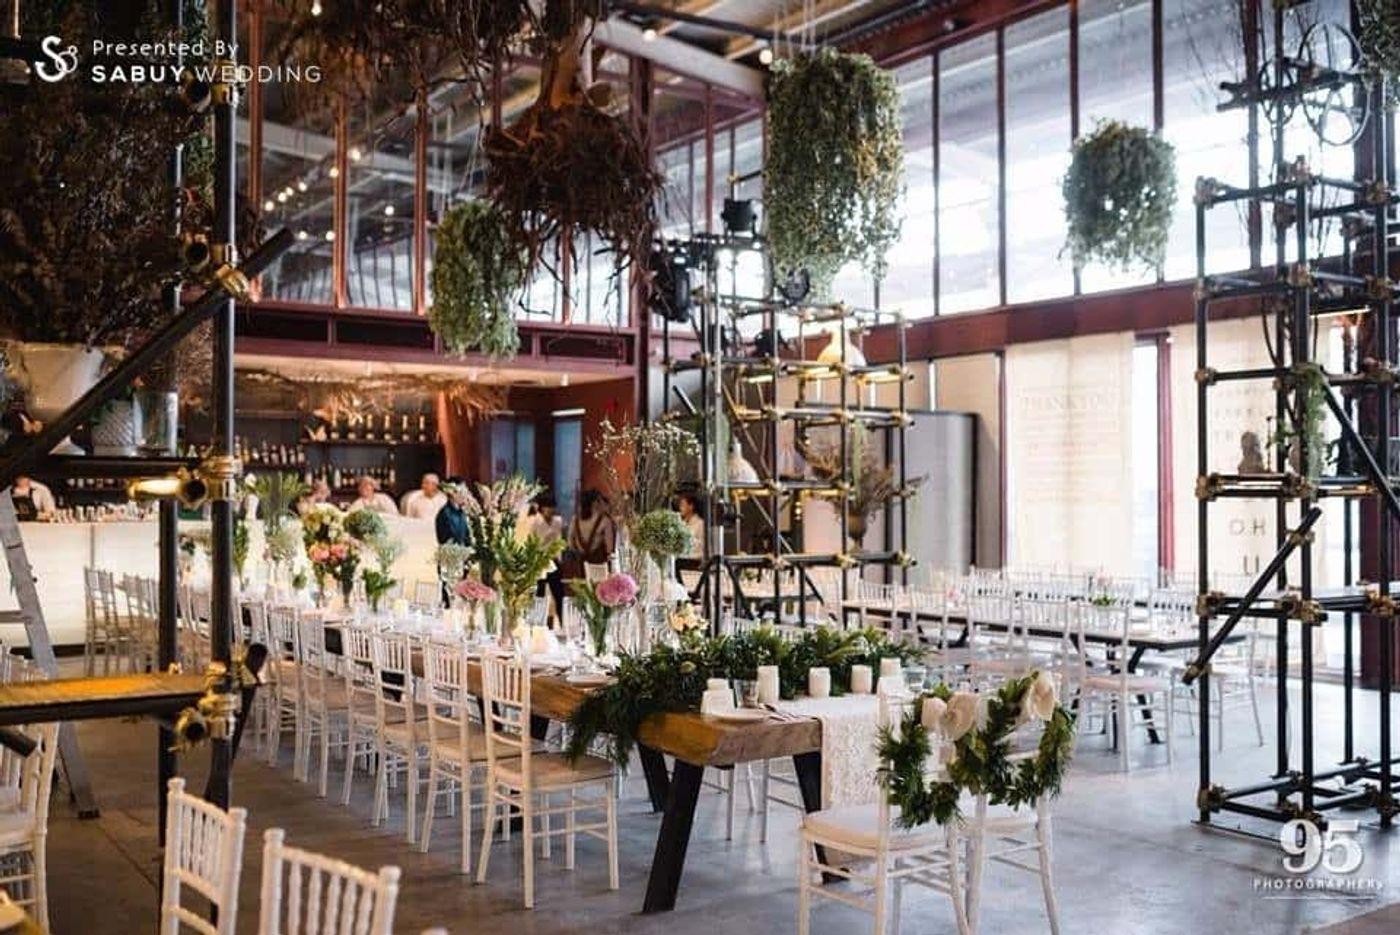 long-table,ตกแต่งงานแต่ง,จัดดอกไม้งานแต่ง,สถานที่แต่งงาน,สถานที่จัดงานแต่งงาน รีวิวงานแต่ง กิมมิคสนุกทุก Sequence ปังจนเพื่อนยังต้องยกนิ้ว @Vivarium by Chef Ministry